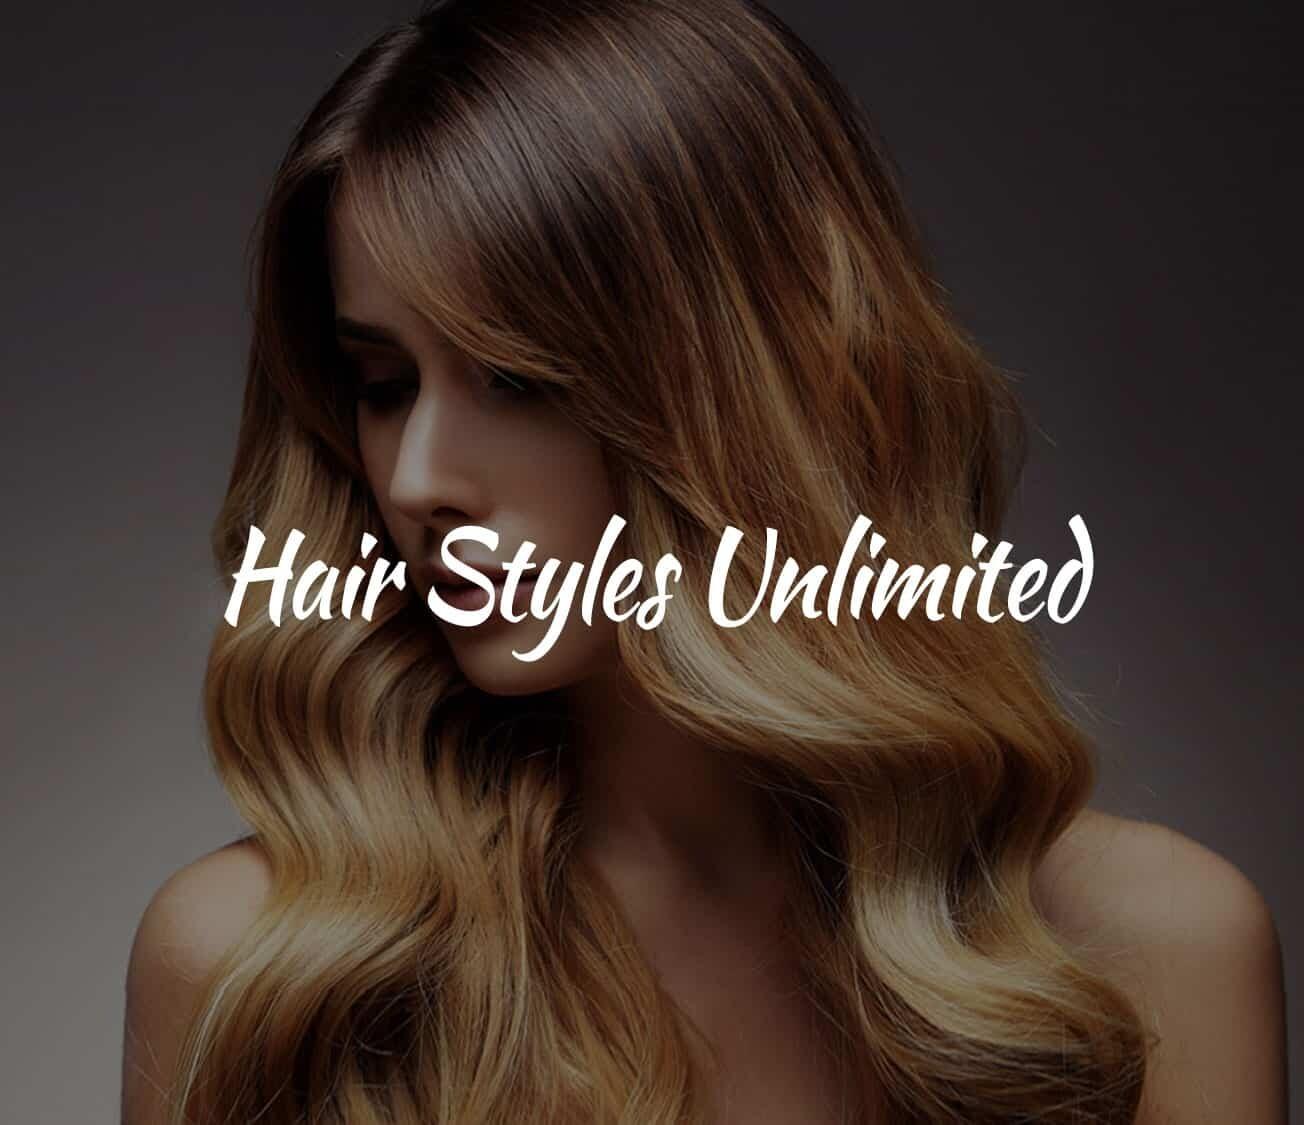 Hair Salon Web Design Specialists